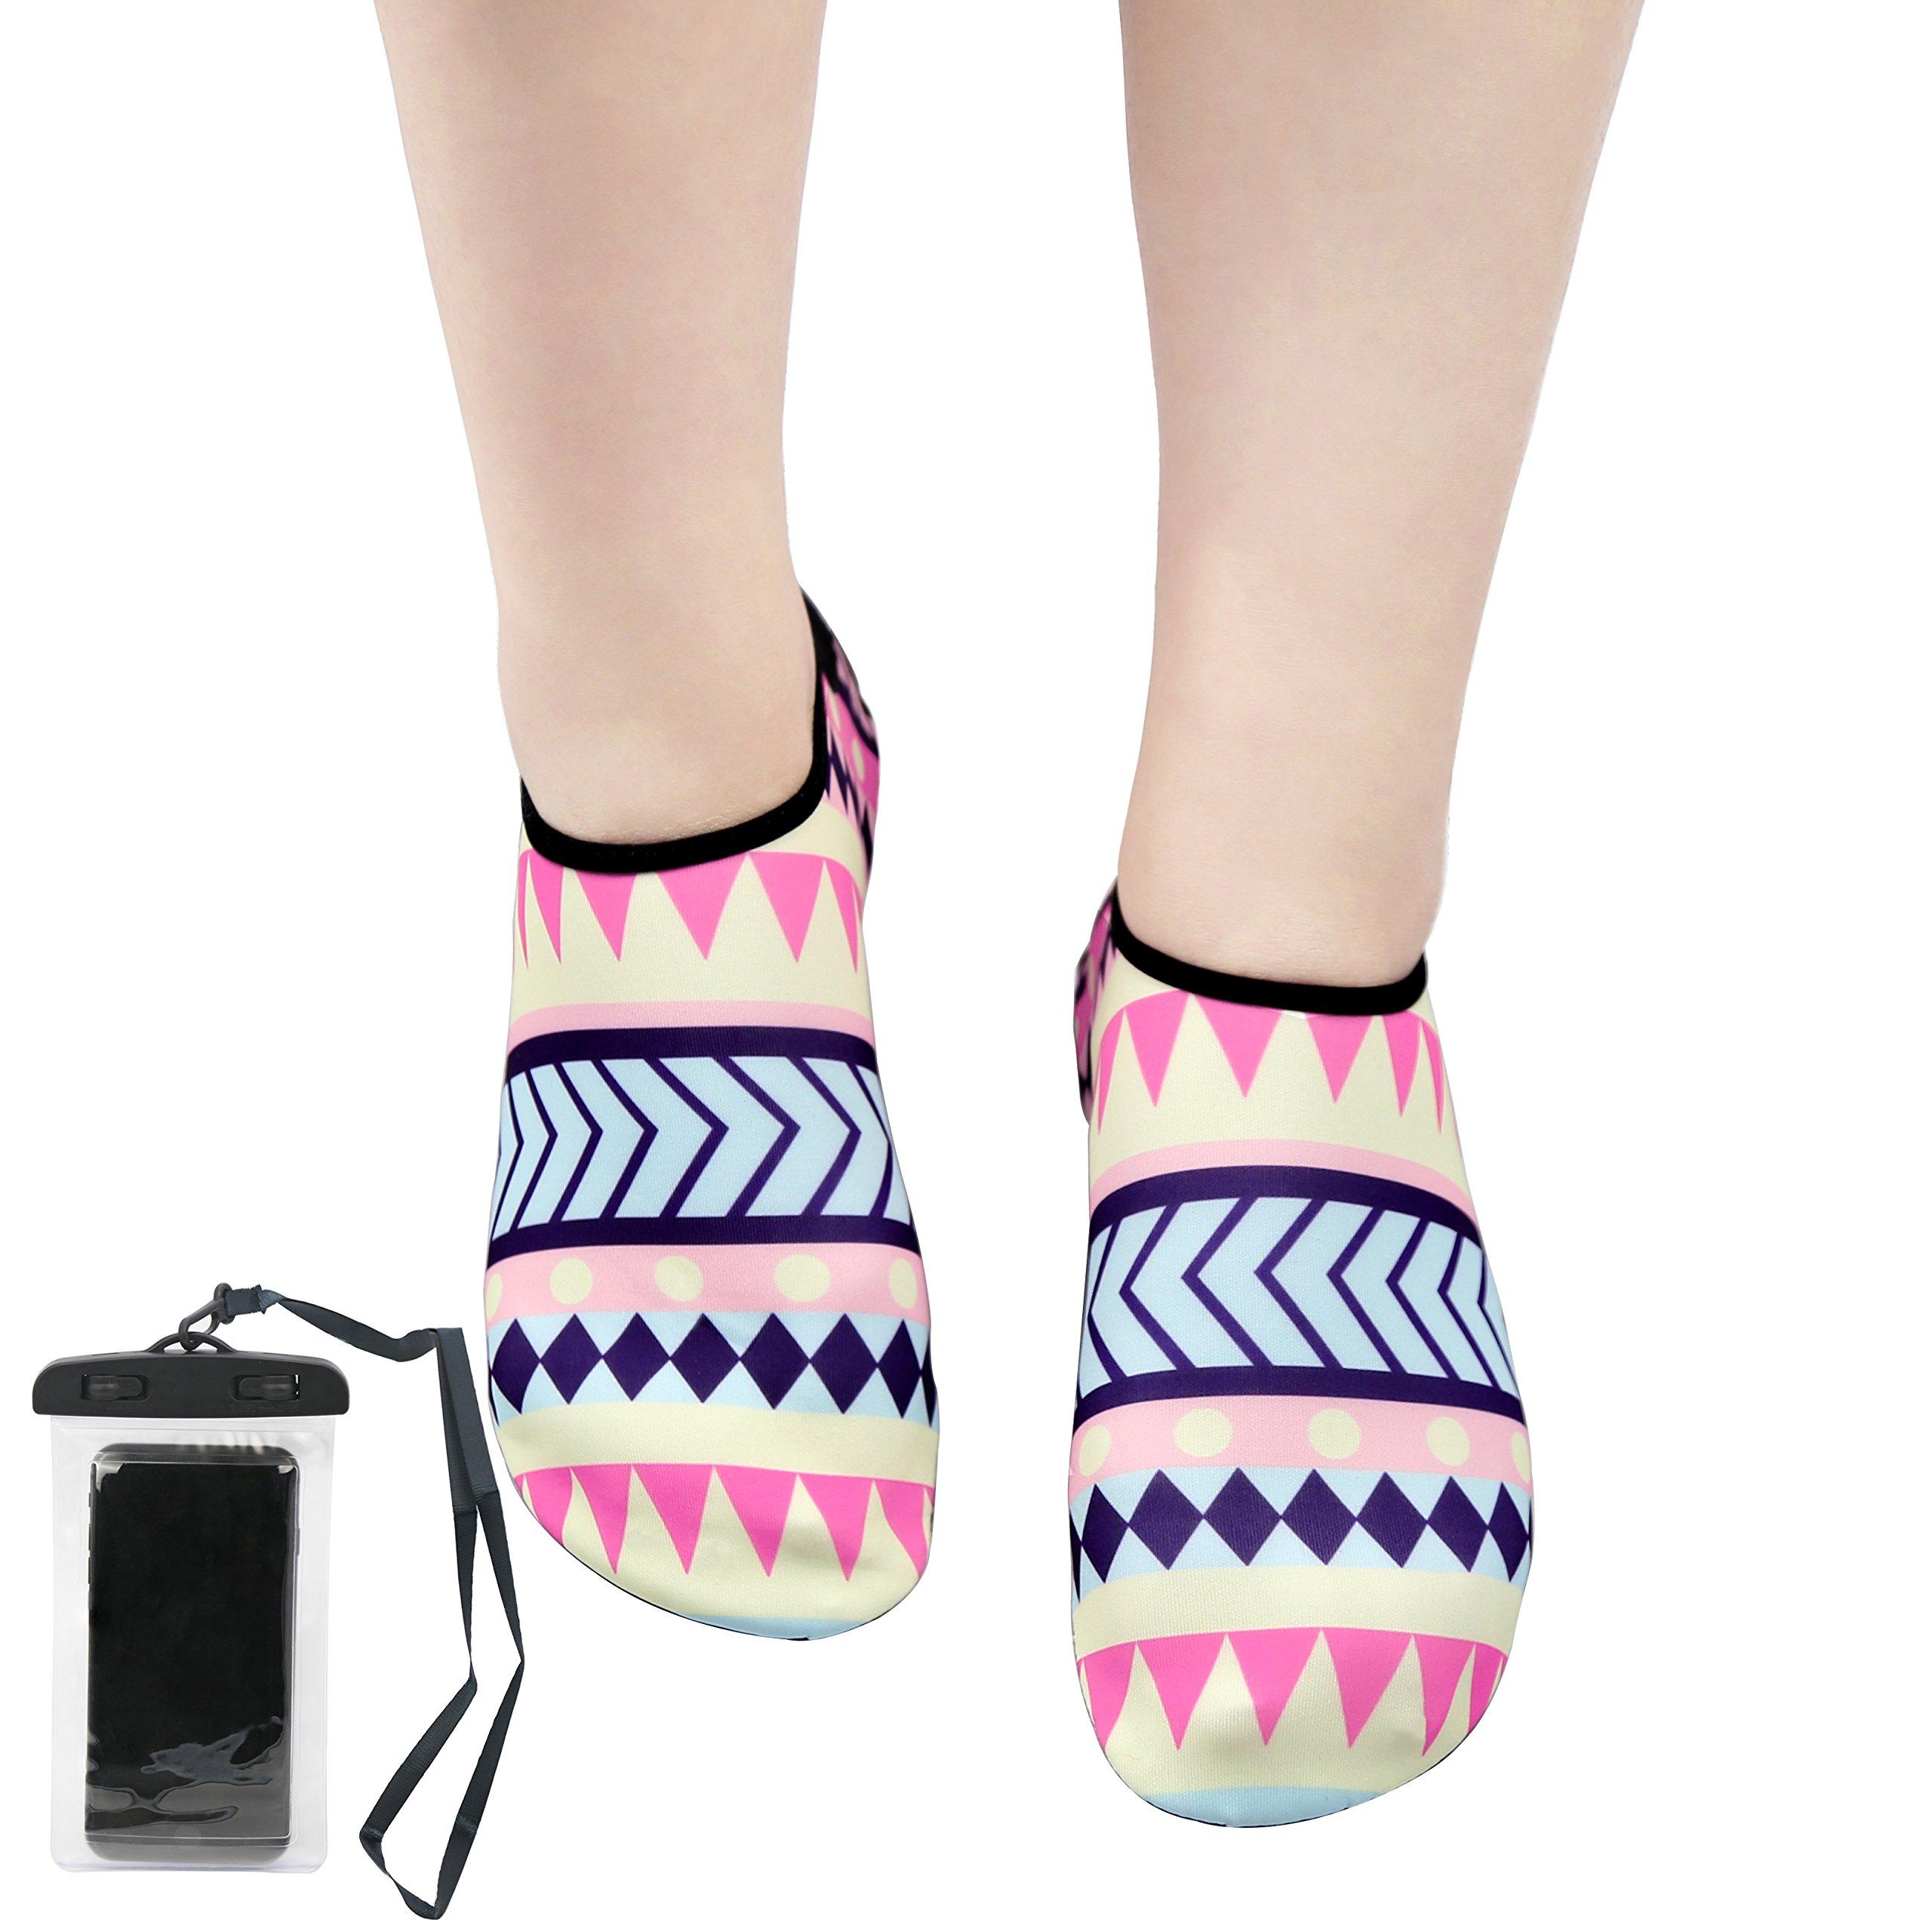 Jingshen Shop Womens and Mens Water Sports Shoes Summer Outdoor Quick-Dry Aqua Socks for Beach Swim Surf Yoga Exercise(L(US Women 9.5-10.5/Men 8.5-9), Bohemian)